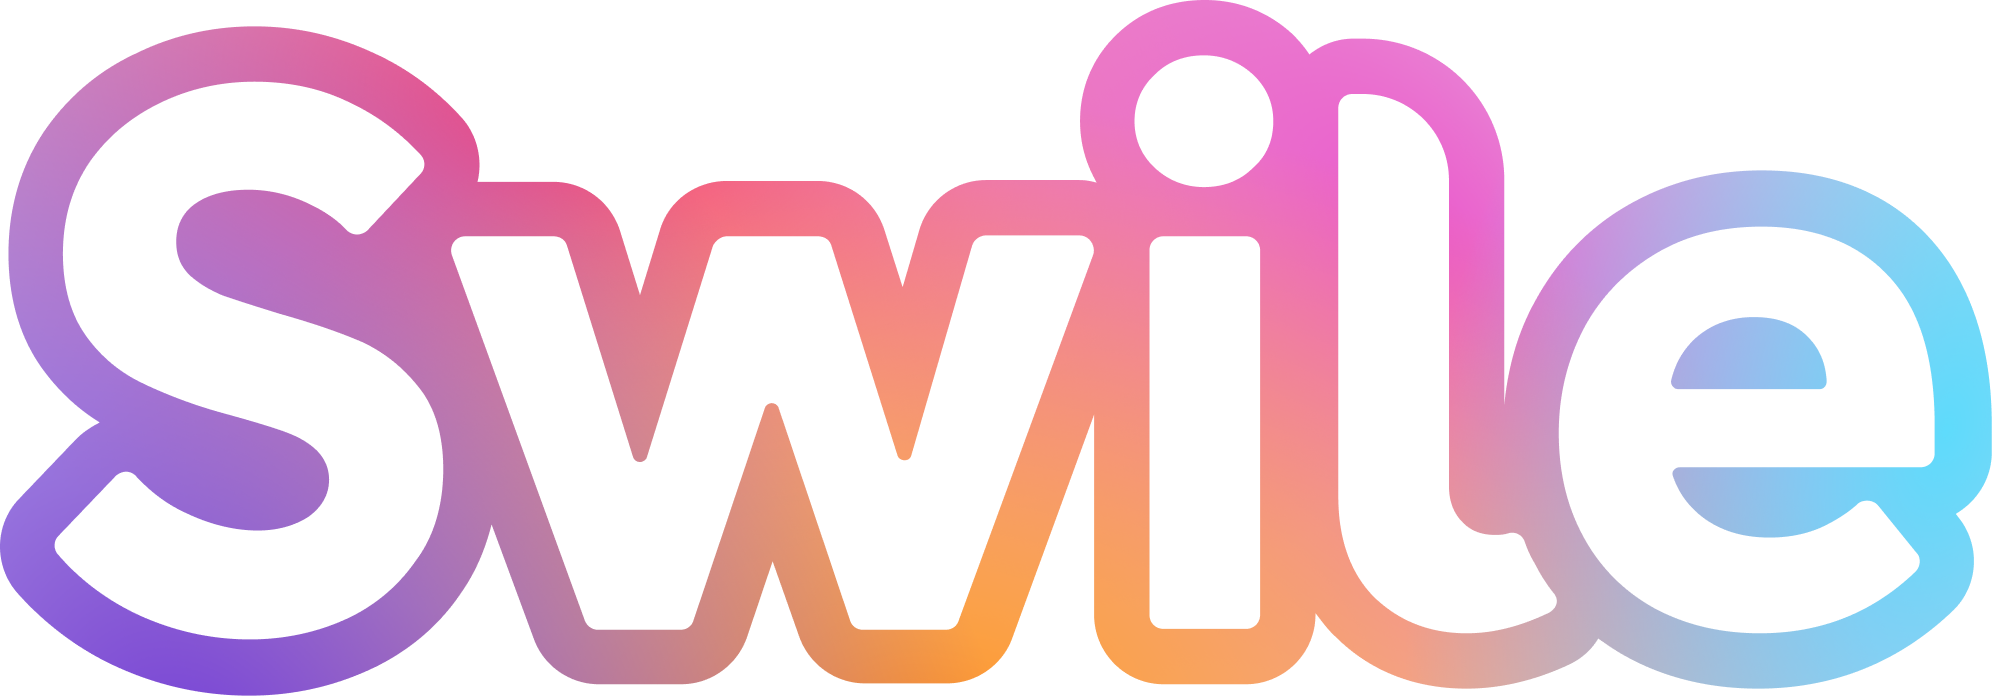 logo-swile